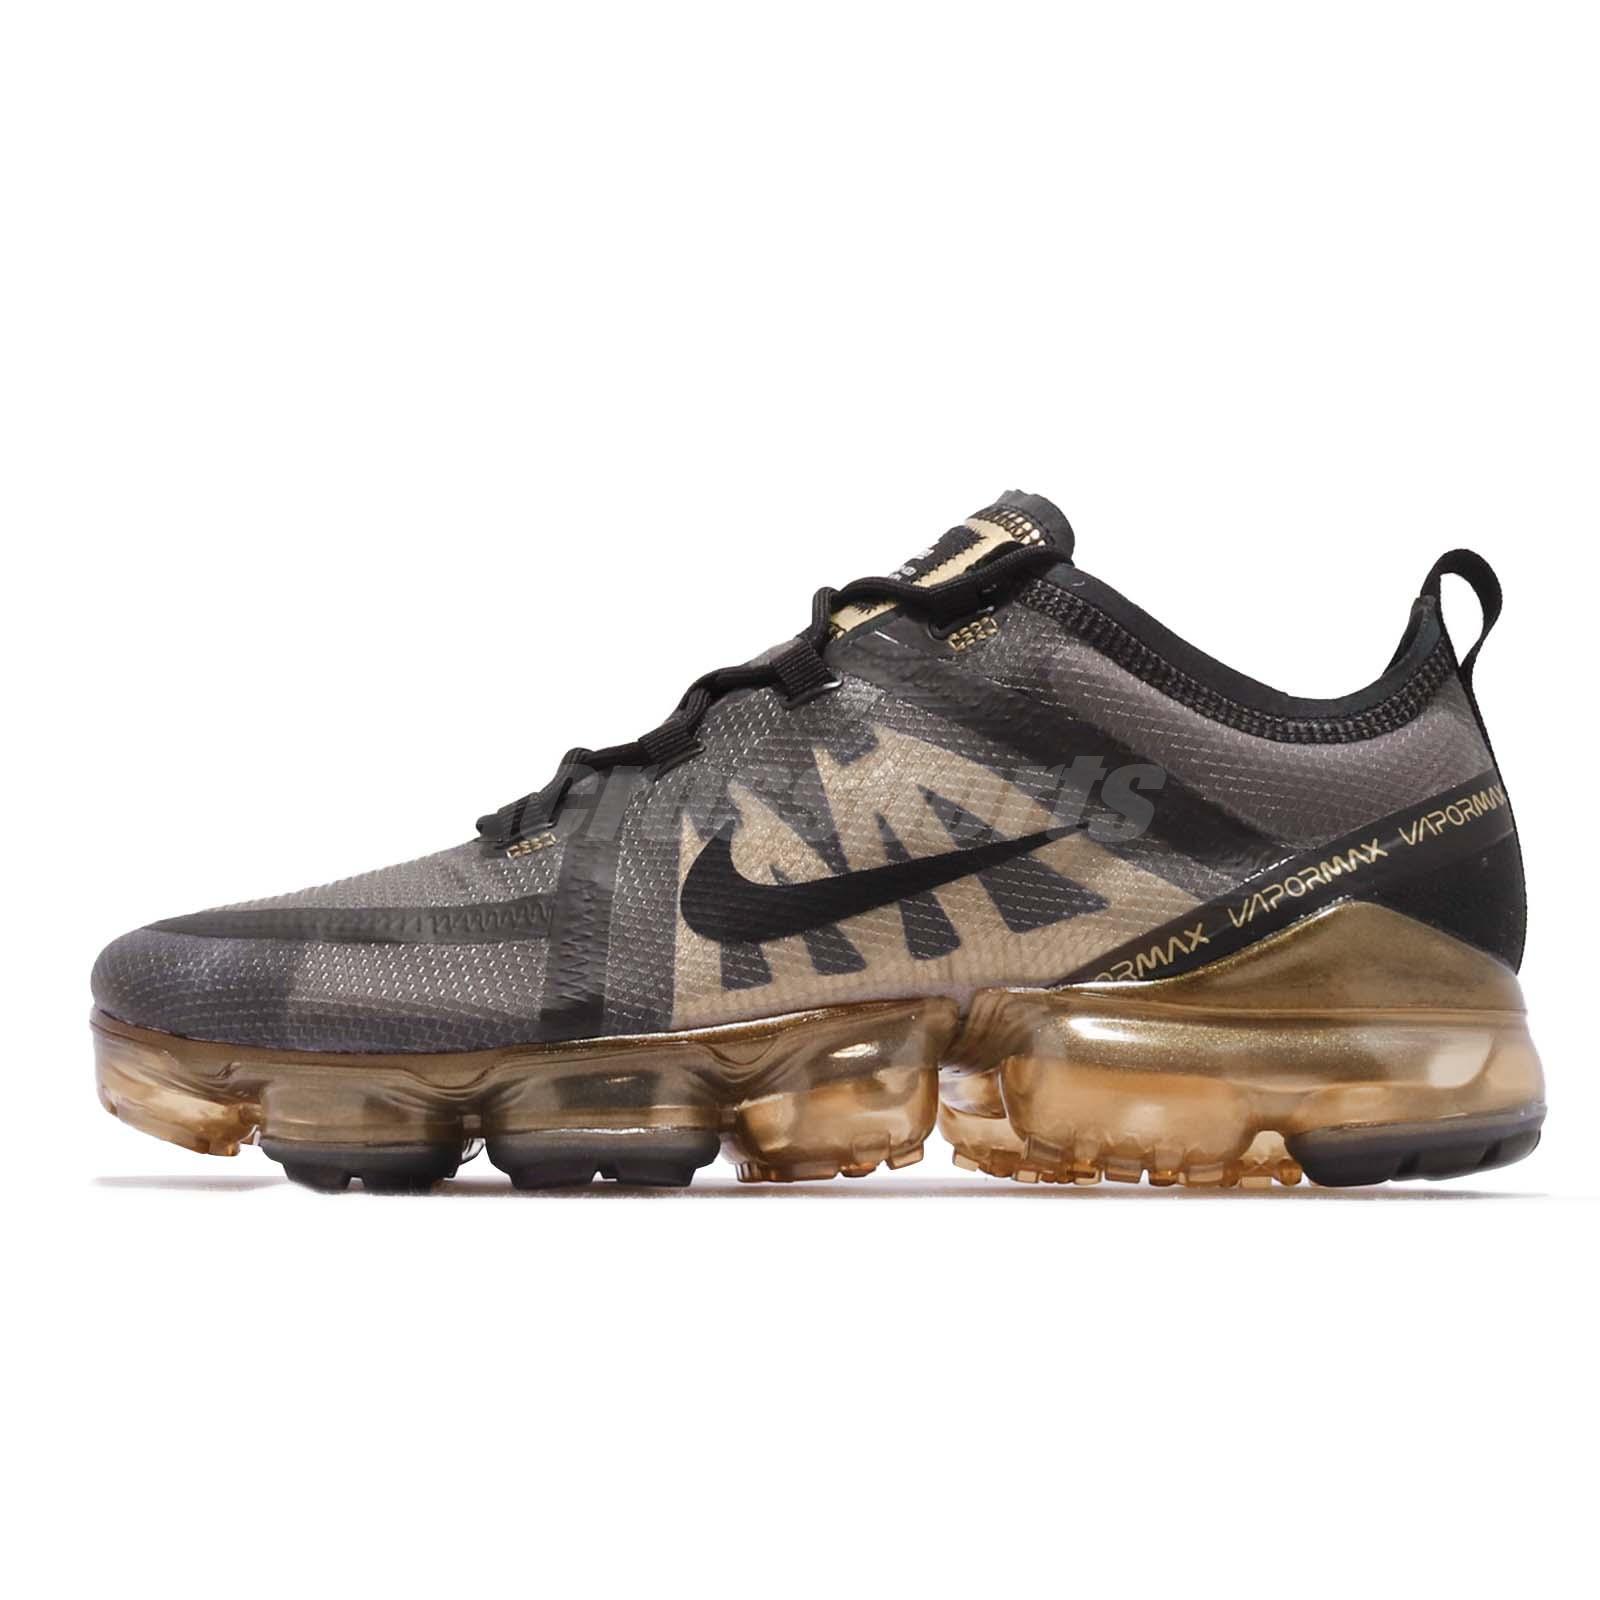 85d7f12dc7c Nike Air Vapormax 2019 Black Gold Max Mens Running Shoes Sneakers AR6631-002